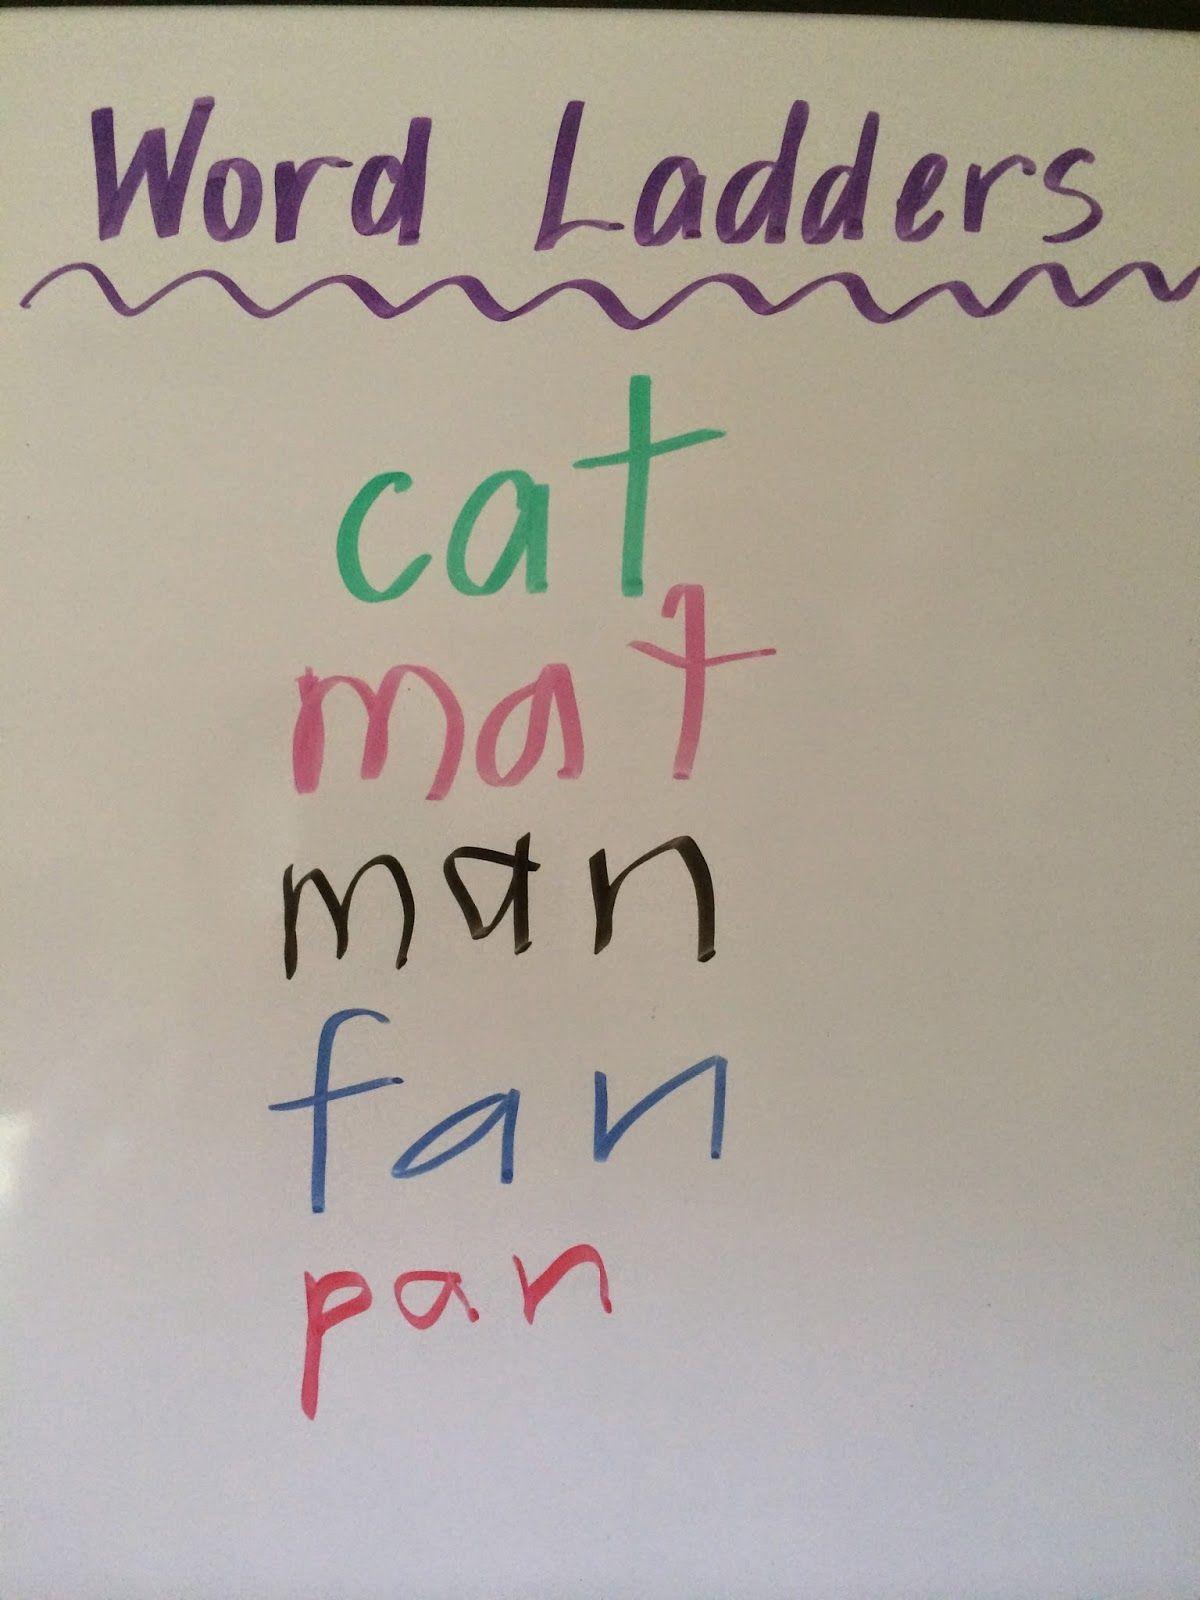 Fun Games 4 Learning Word Ladders